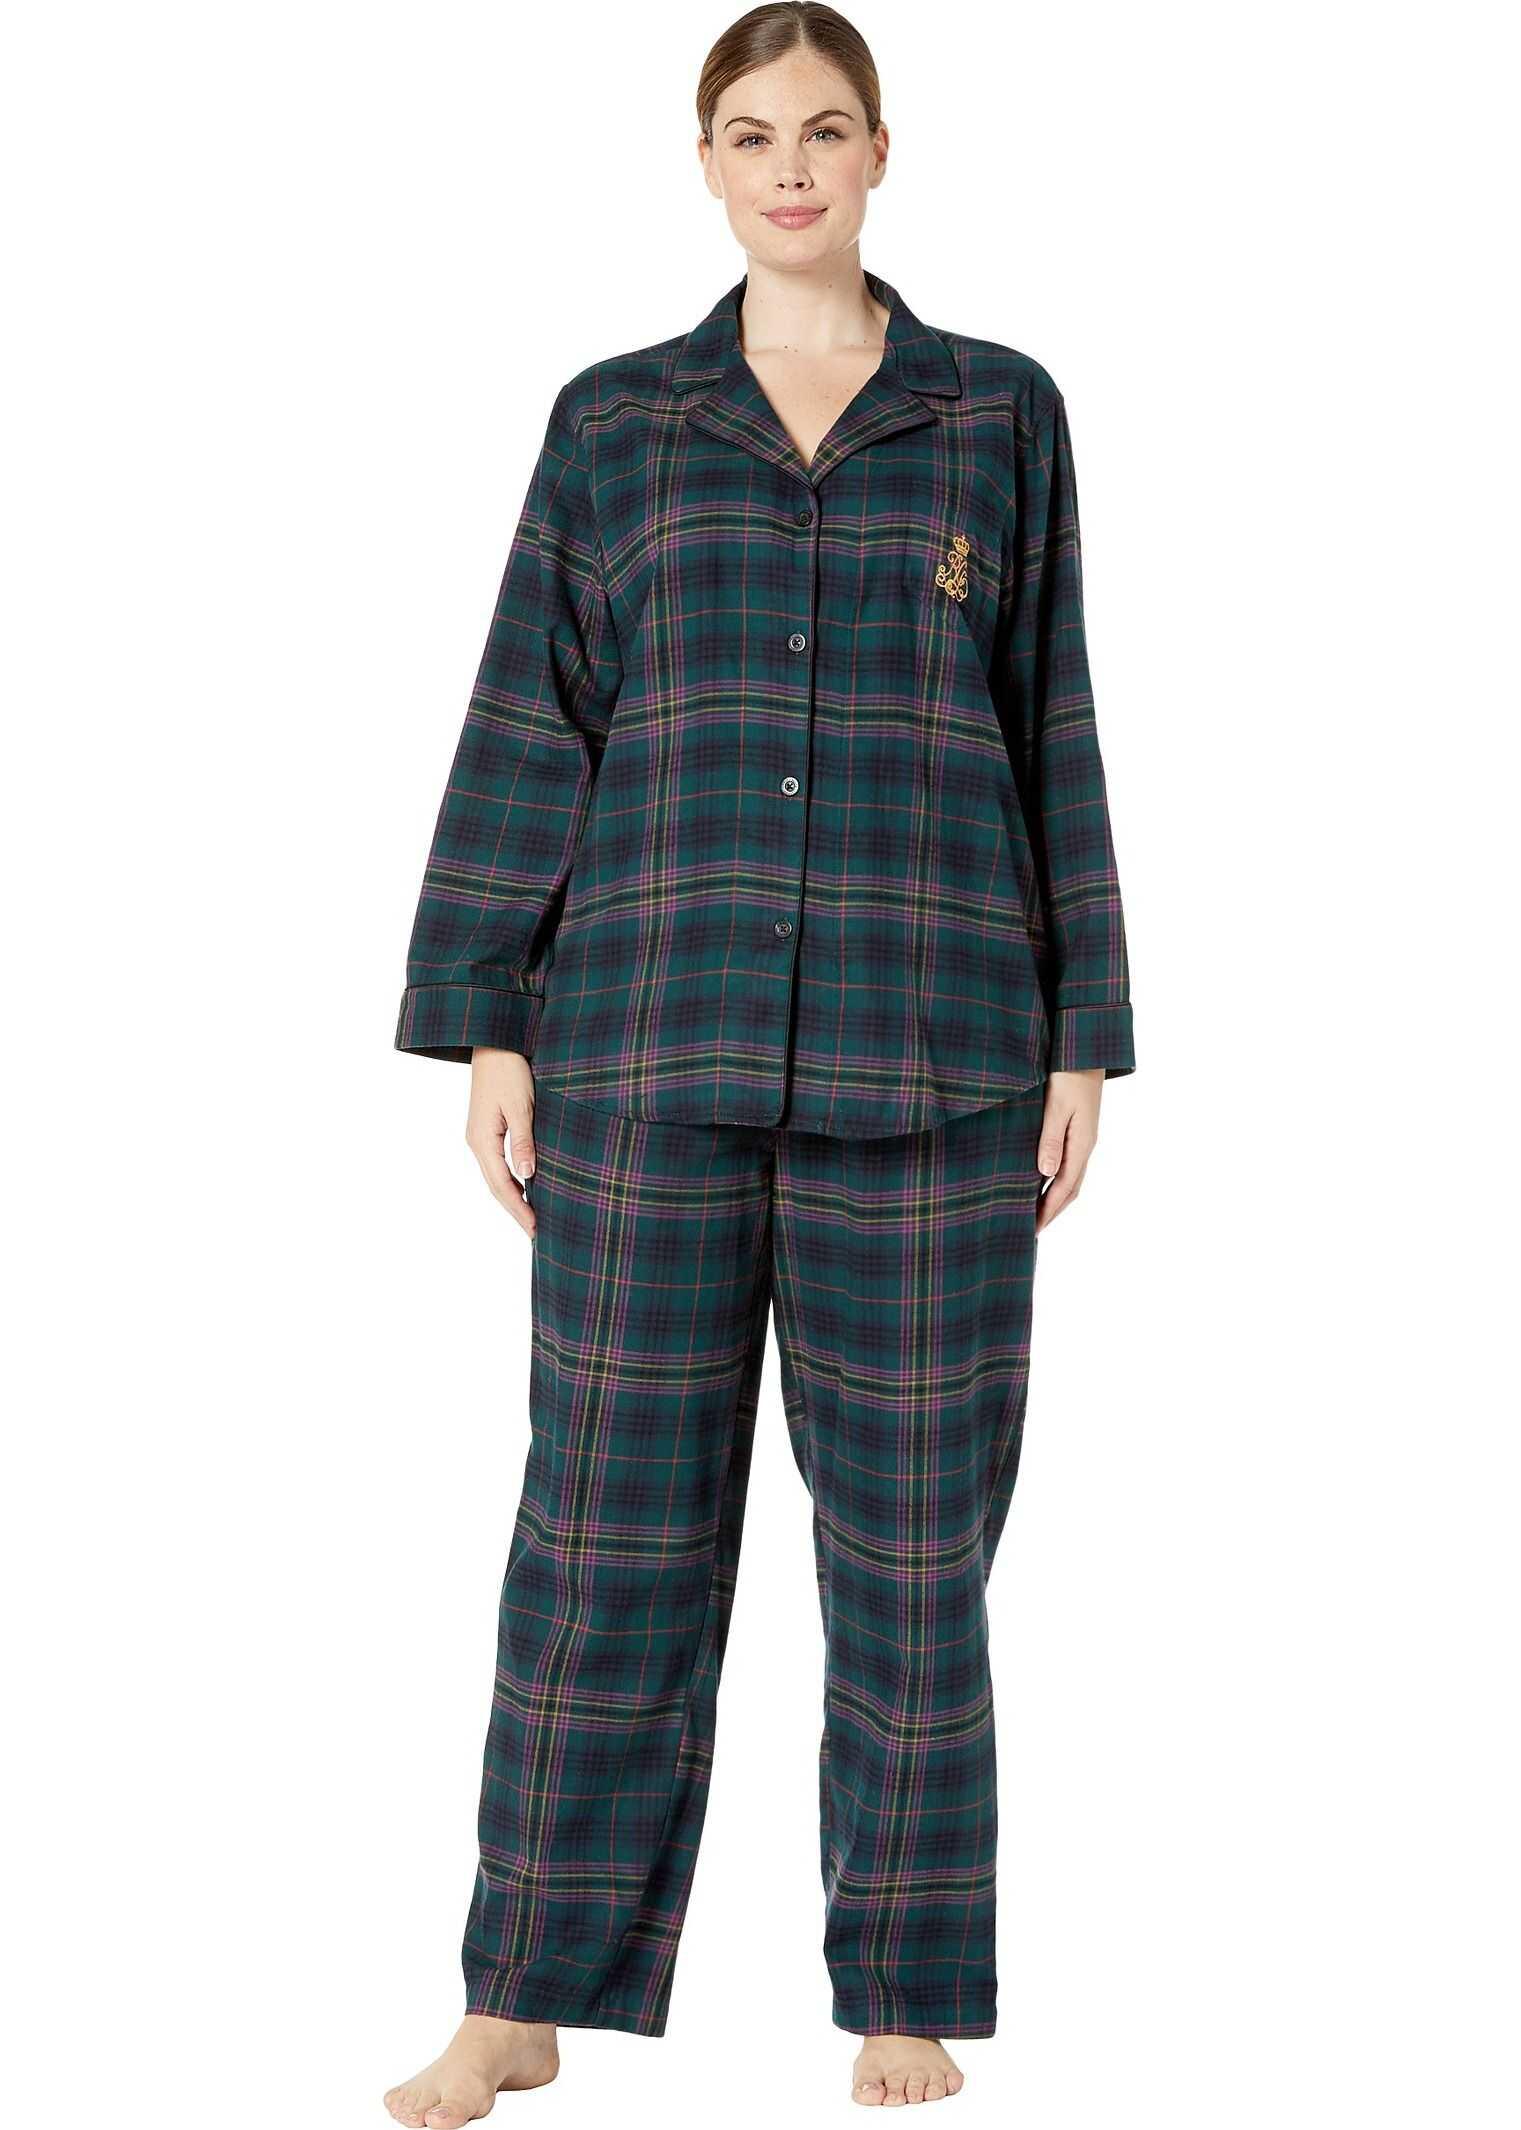 Ralph Lauren Plus Size Brushed Twill Long Sleeve Notch Collar Long Pants Pajama Set Green Plaid